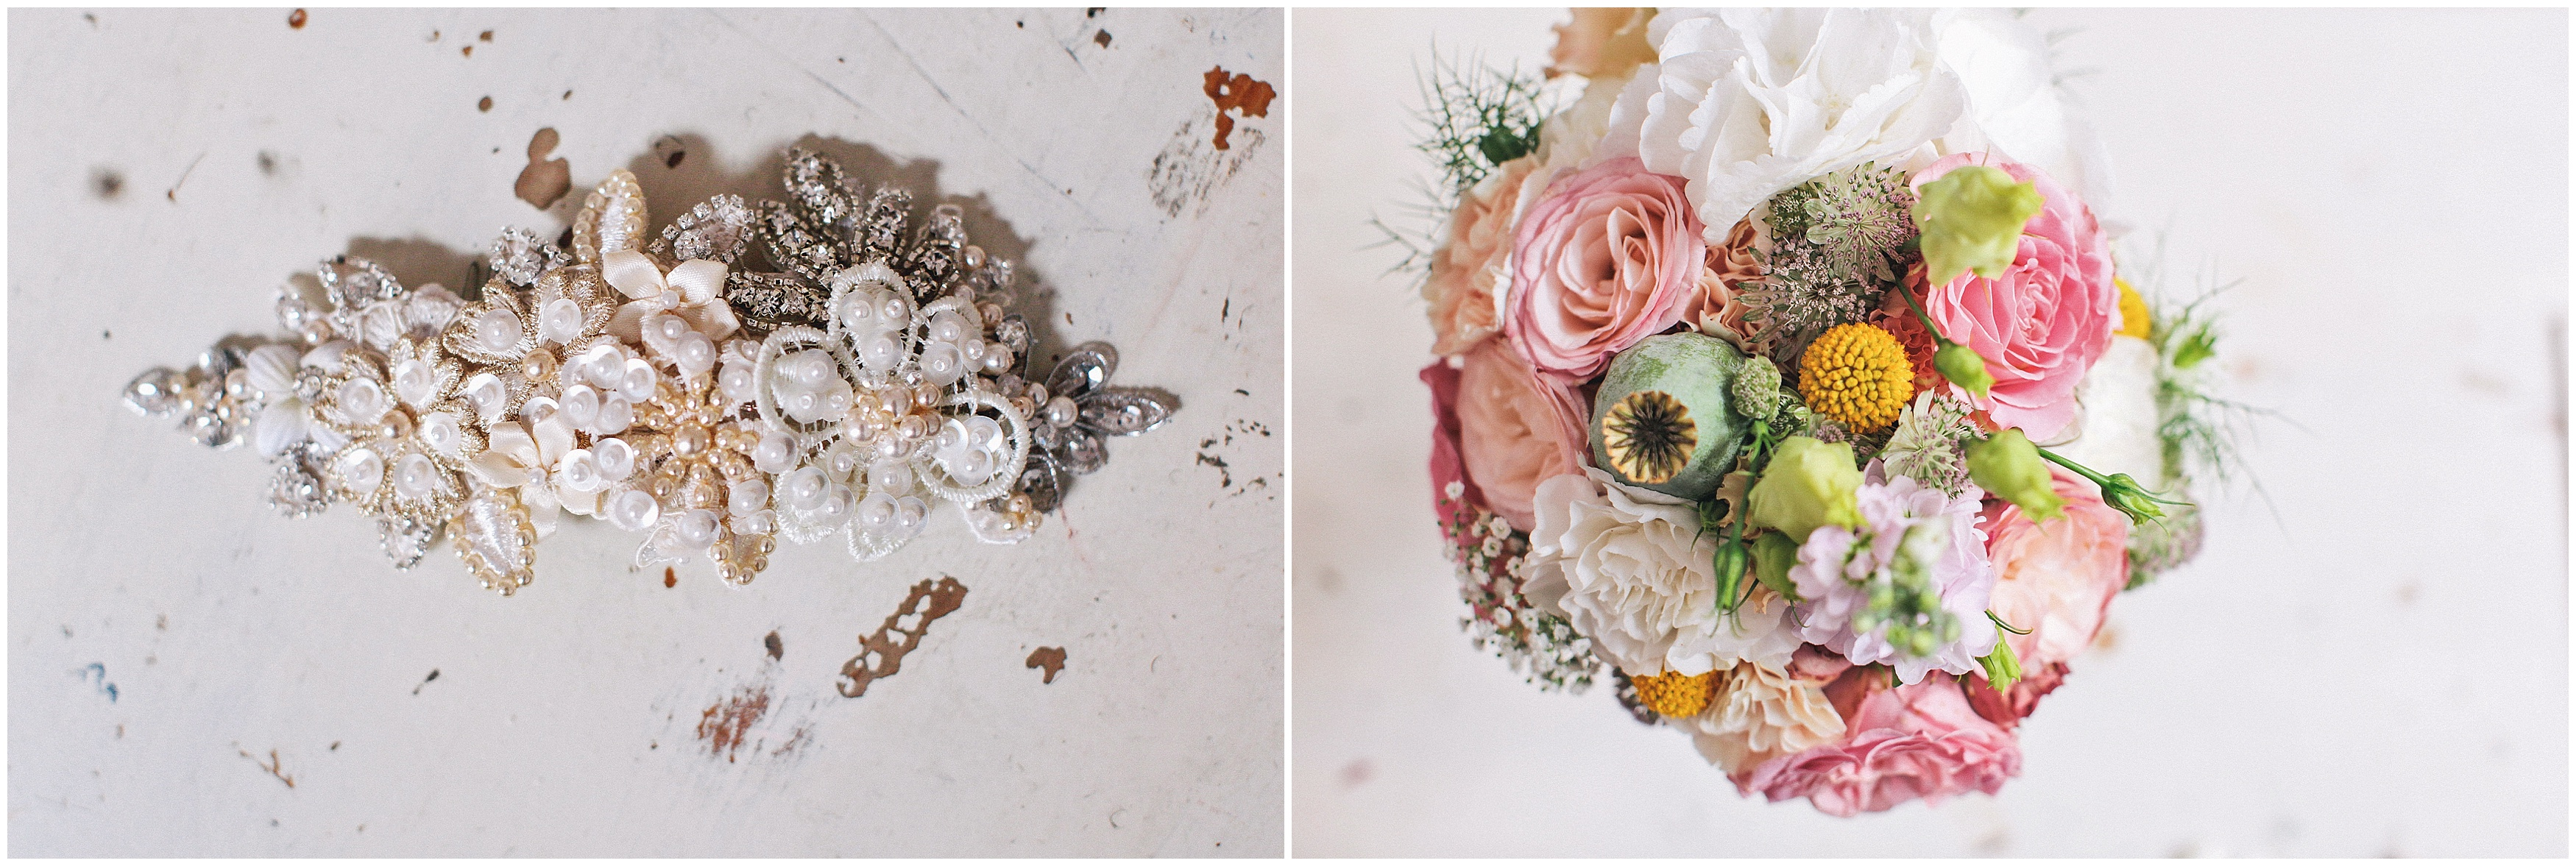 ivy&olive_Hochzeitsplanung_Nancy_Ebert_Fotografie_Vintage_Wedding_0006